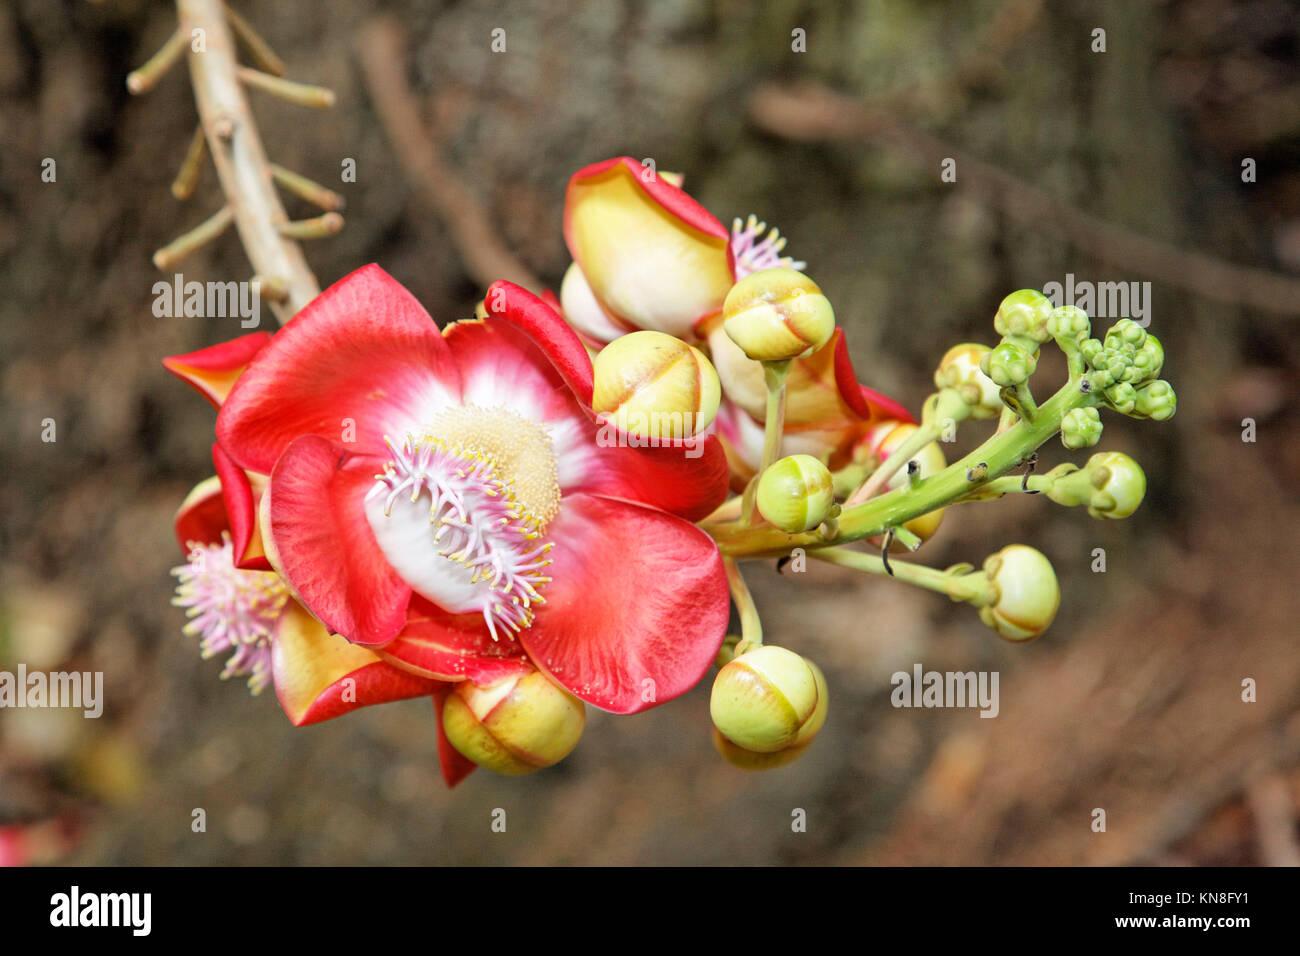 Cannonball tree flower, botanical garden, Mahe, Seychelles - Stock Image